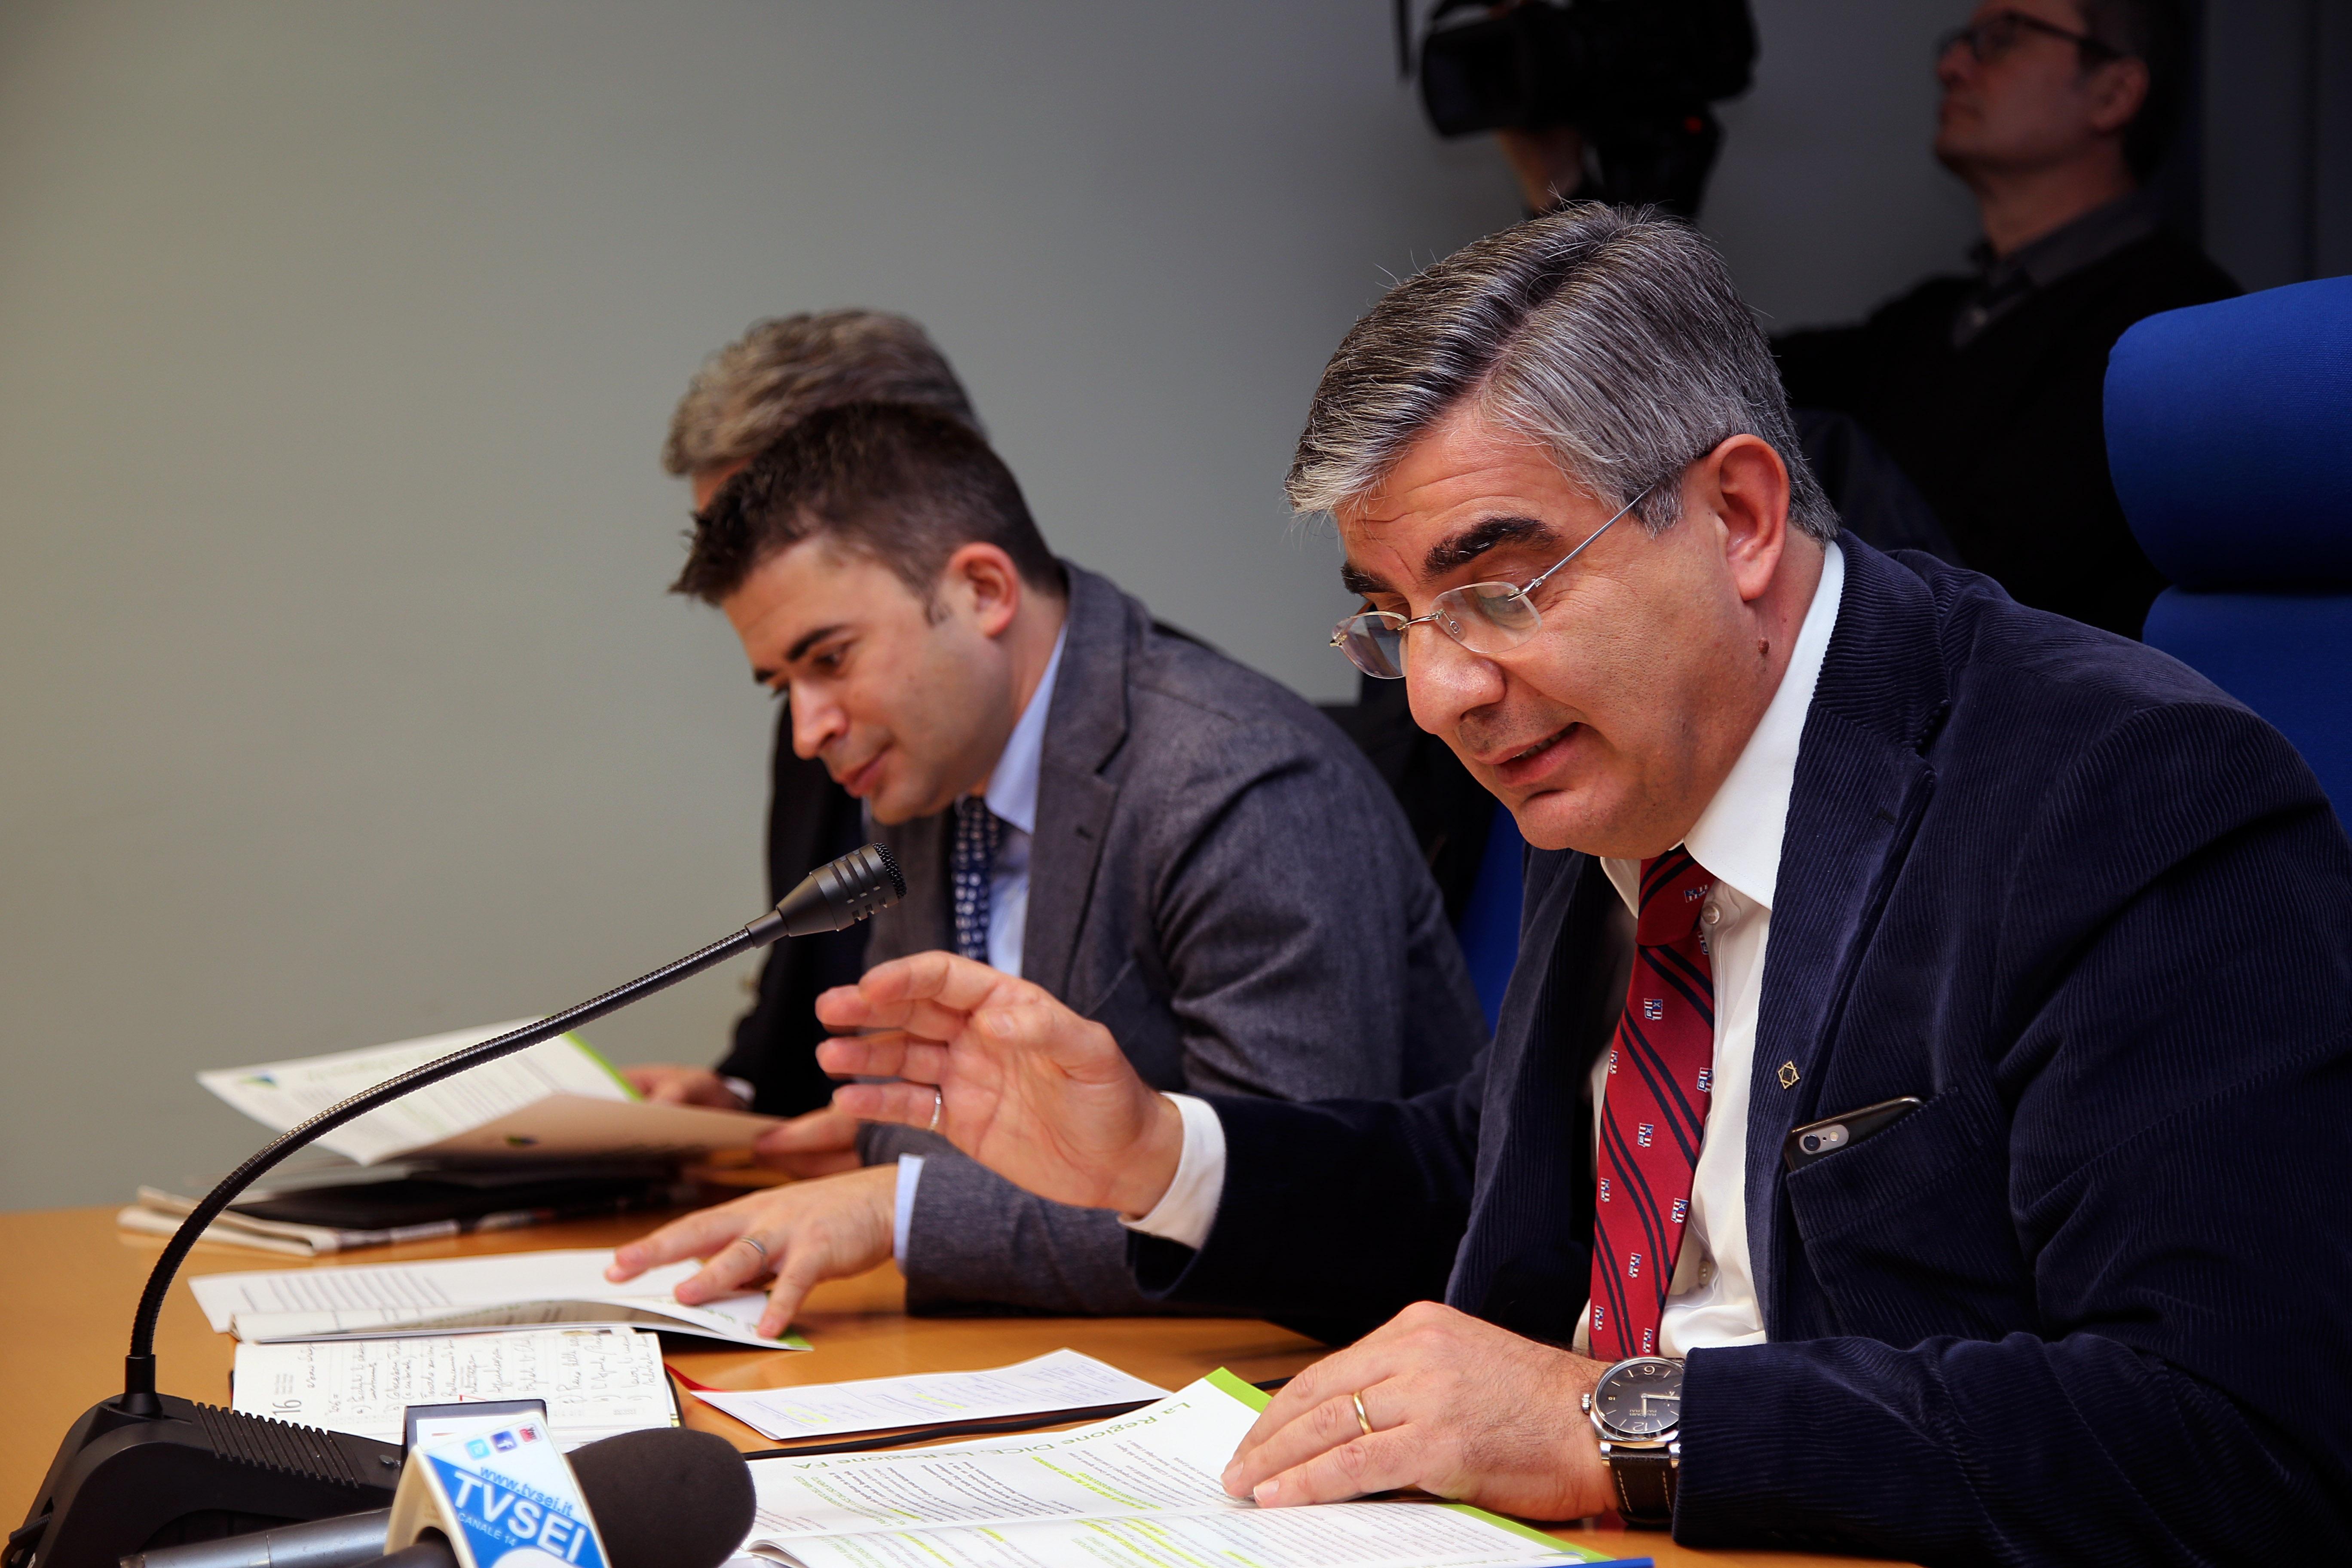 Nuova Pescara: Catena, D'Alfonso rispetterà impegni